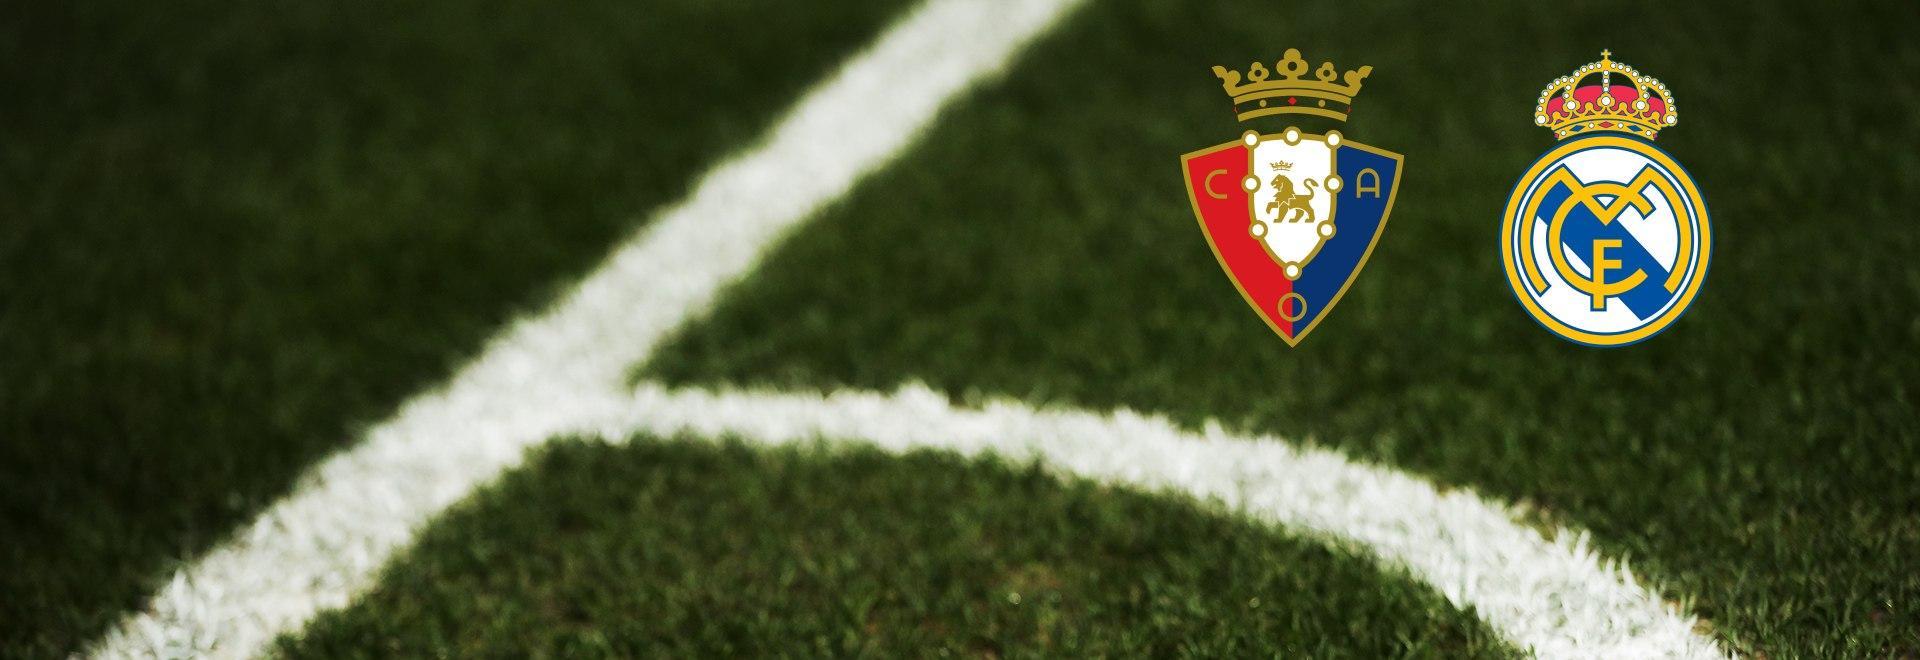 Osasuna - Real Madrid. 23a g.